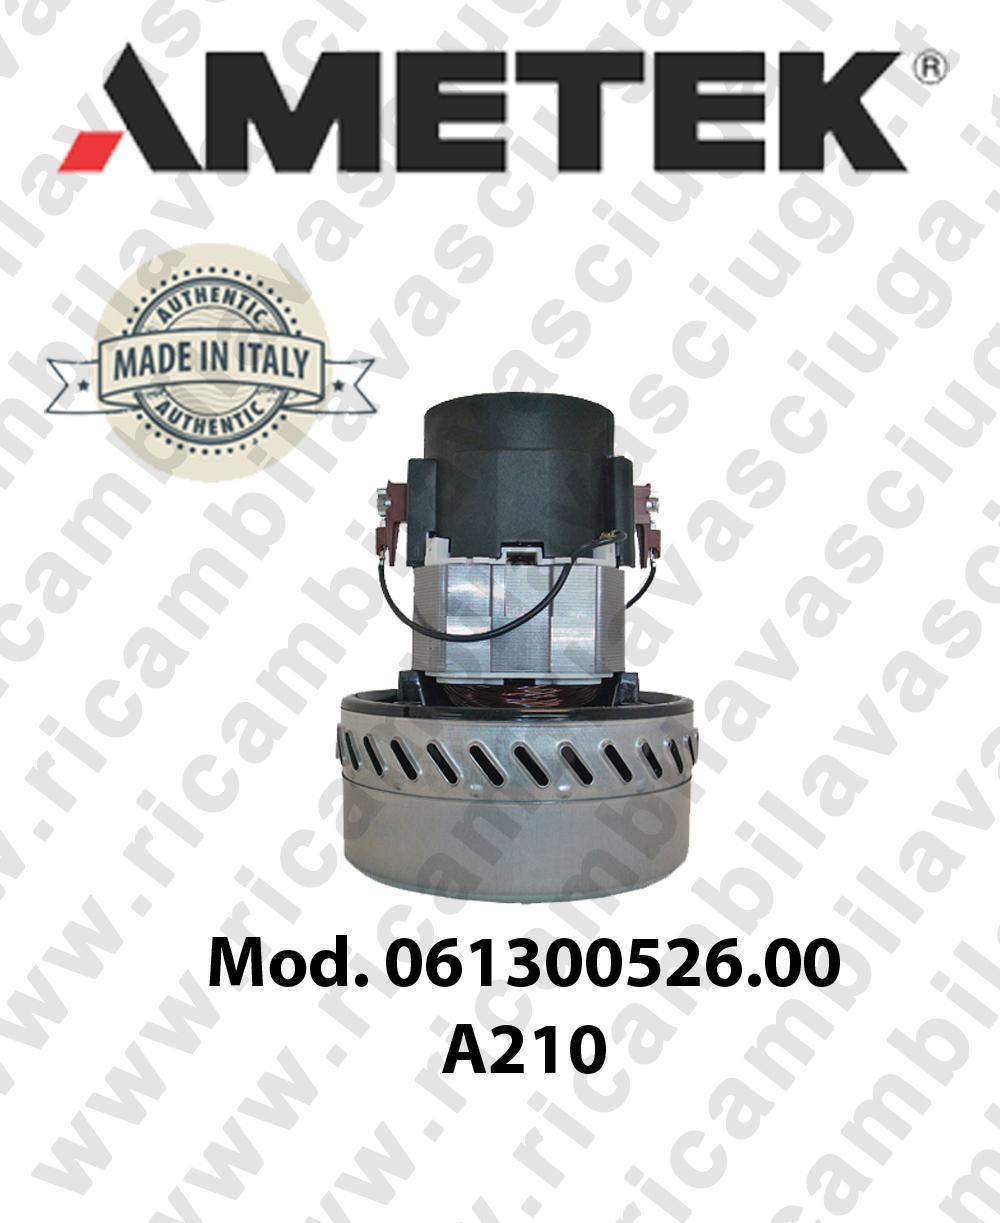 Ametek Vacuum Motor ITALIA 061300526.00 A 210 for vacuum cleaner wet and dry